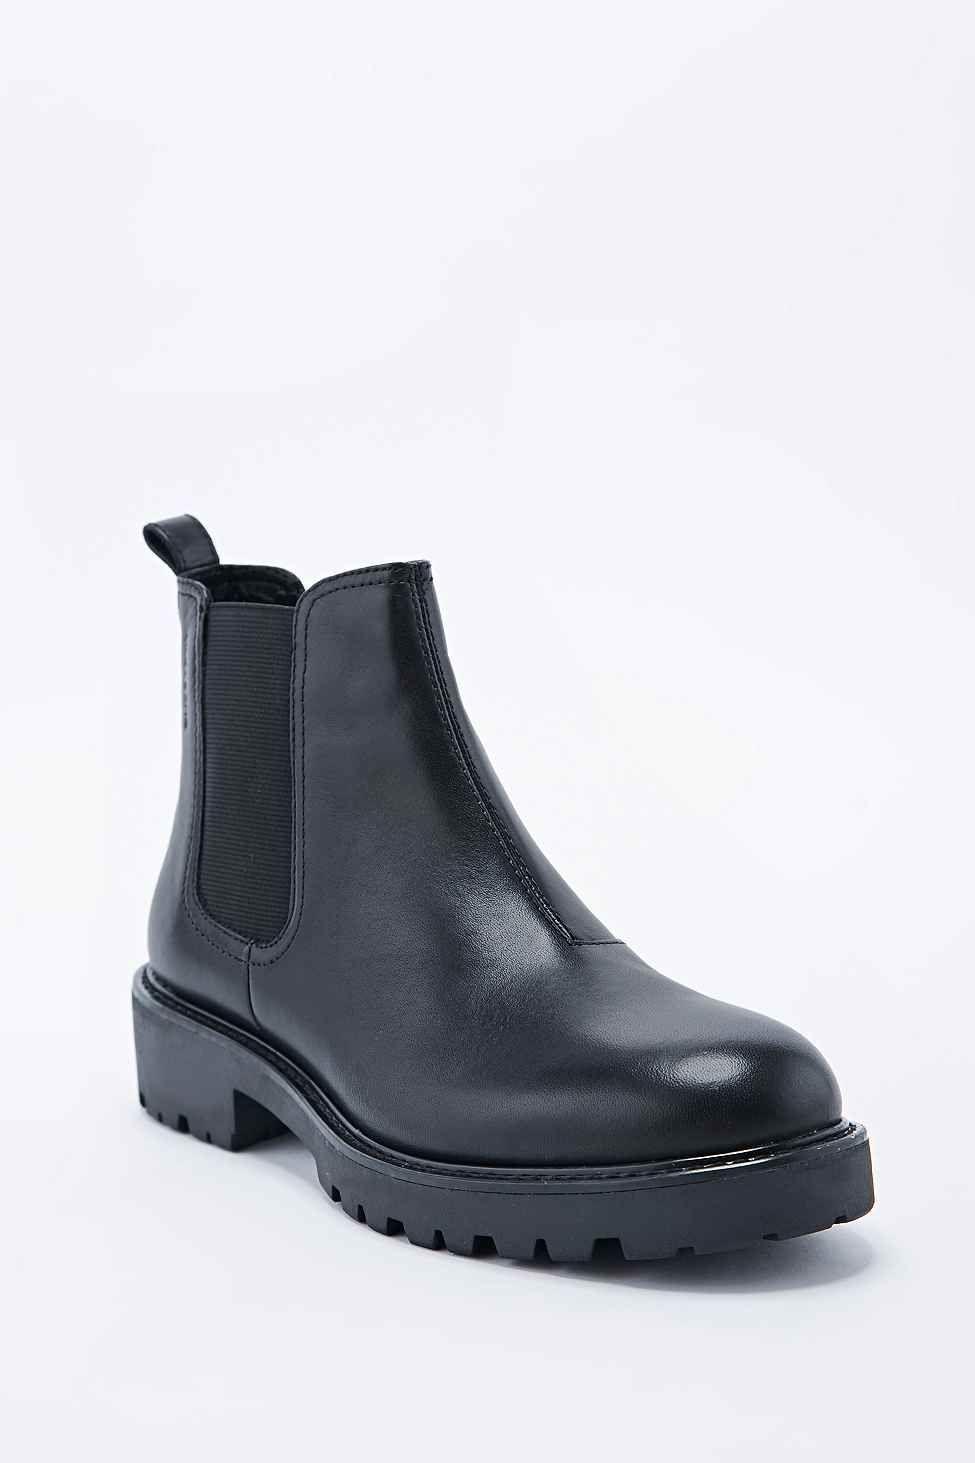 Zapatos negros Vagabond Kenova para mujer Zapatillas de deporte Skech-Air Ultra-Glam para mujer 9ZgiyQ